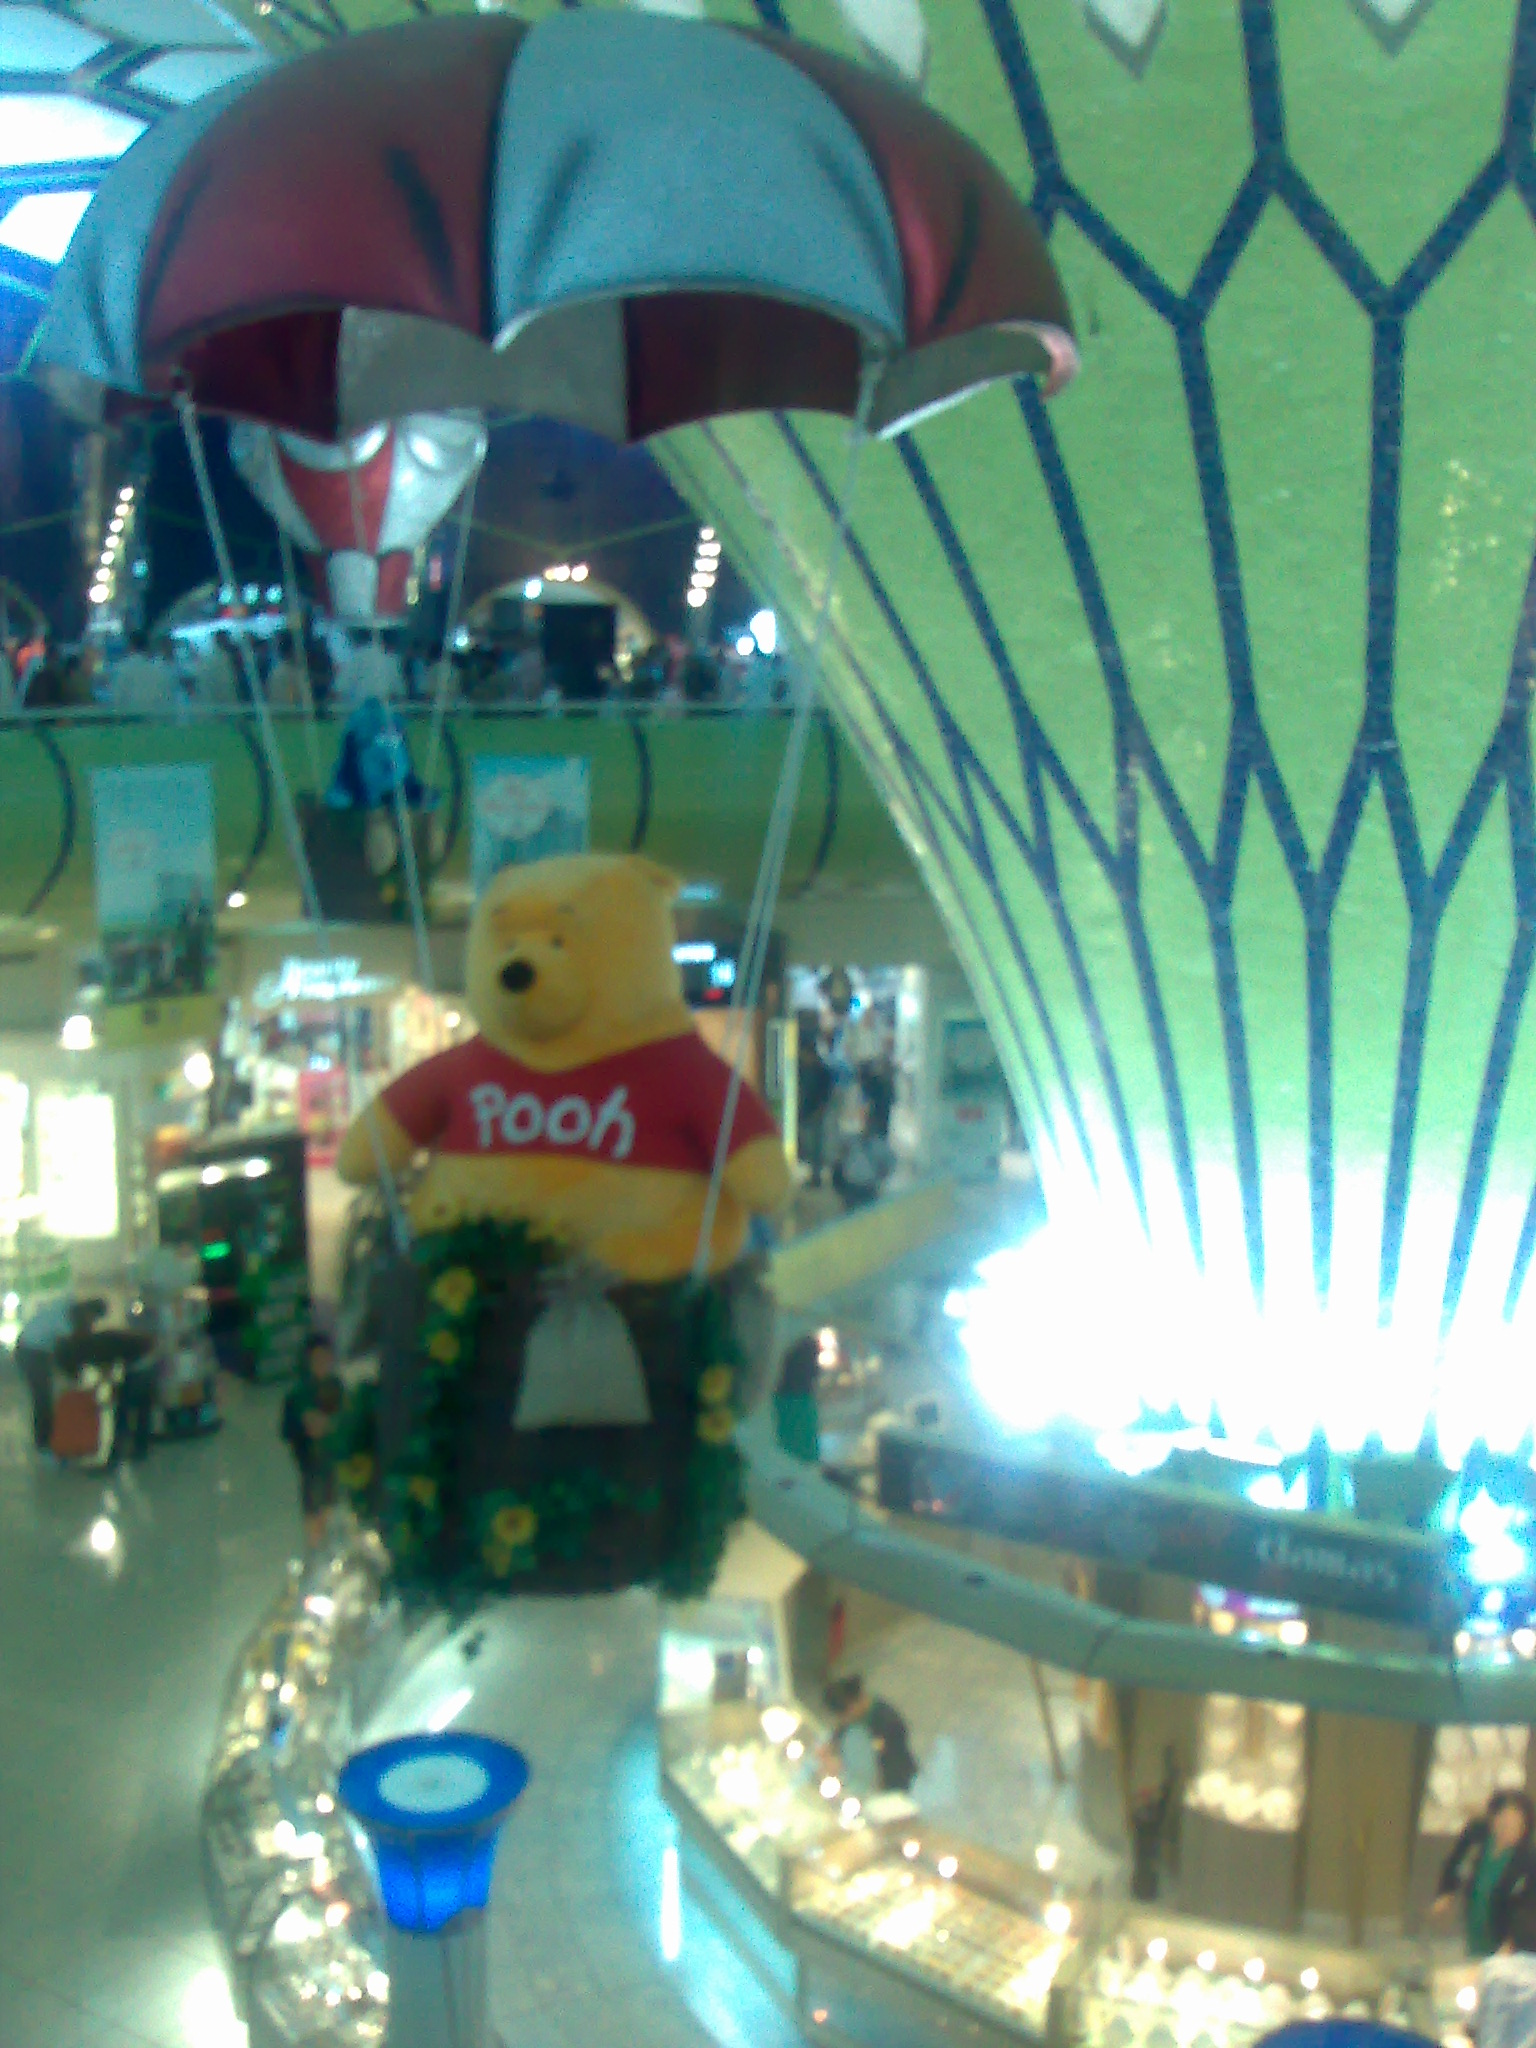 Winnie the Pooh di kubah abu dhabi airport